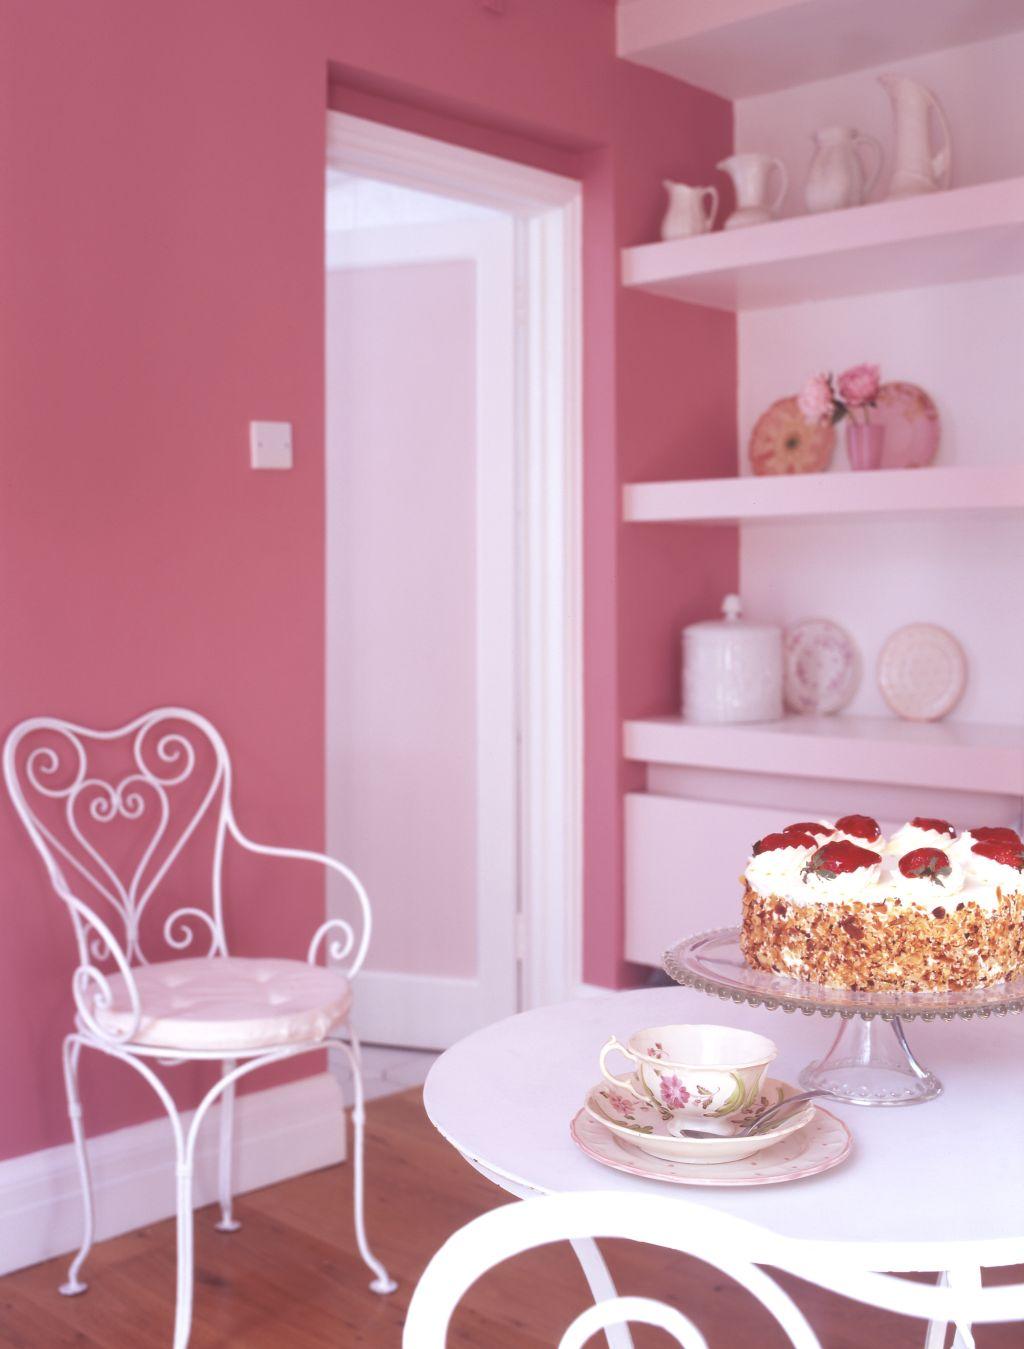 Nuanta de roz in sufragerie cu mobila alba Foto Copyright © Akzo Nobel